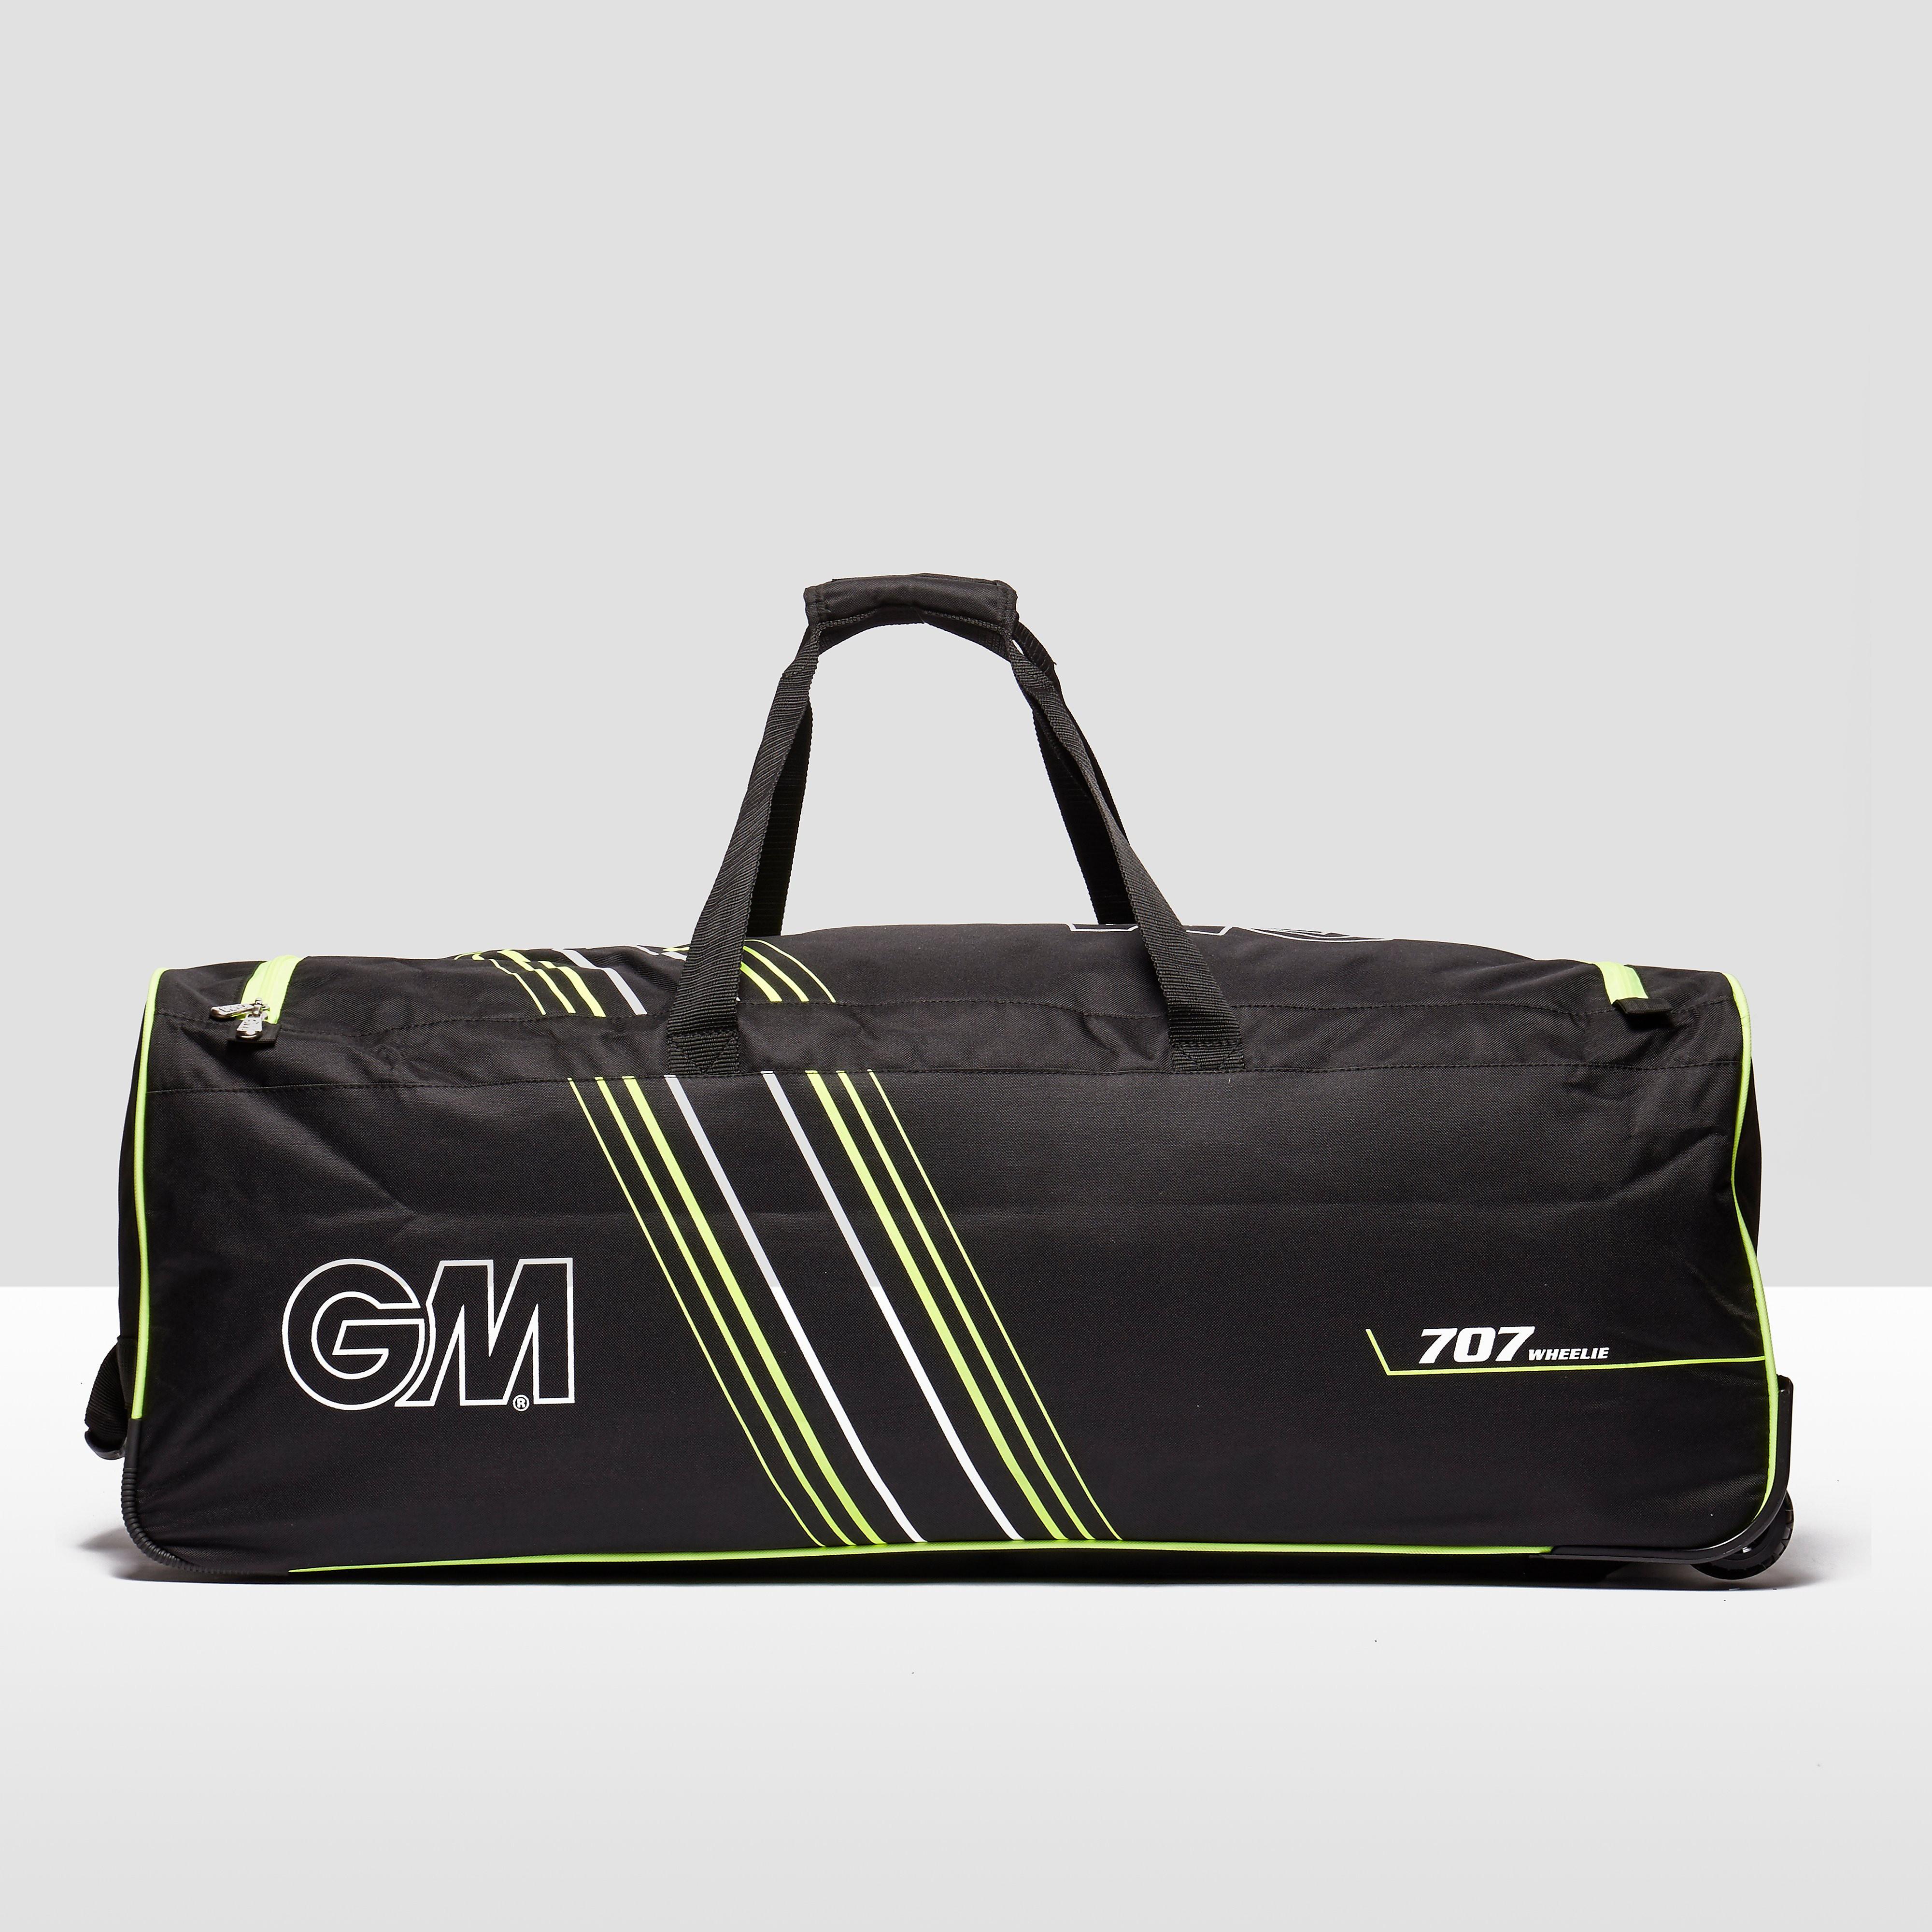 Gunn & Moore 707 Wheelie Cricket Bag